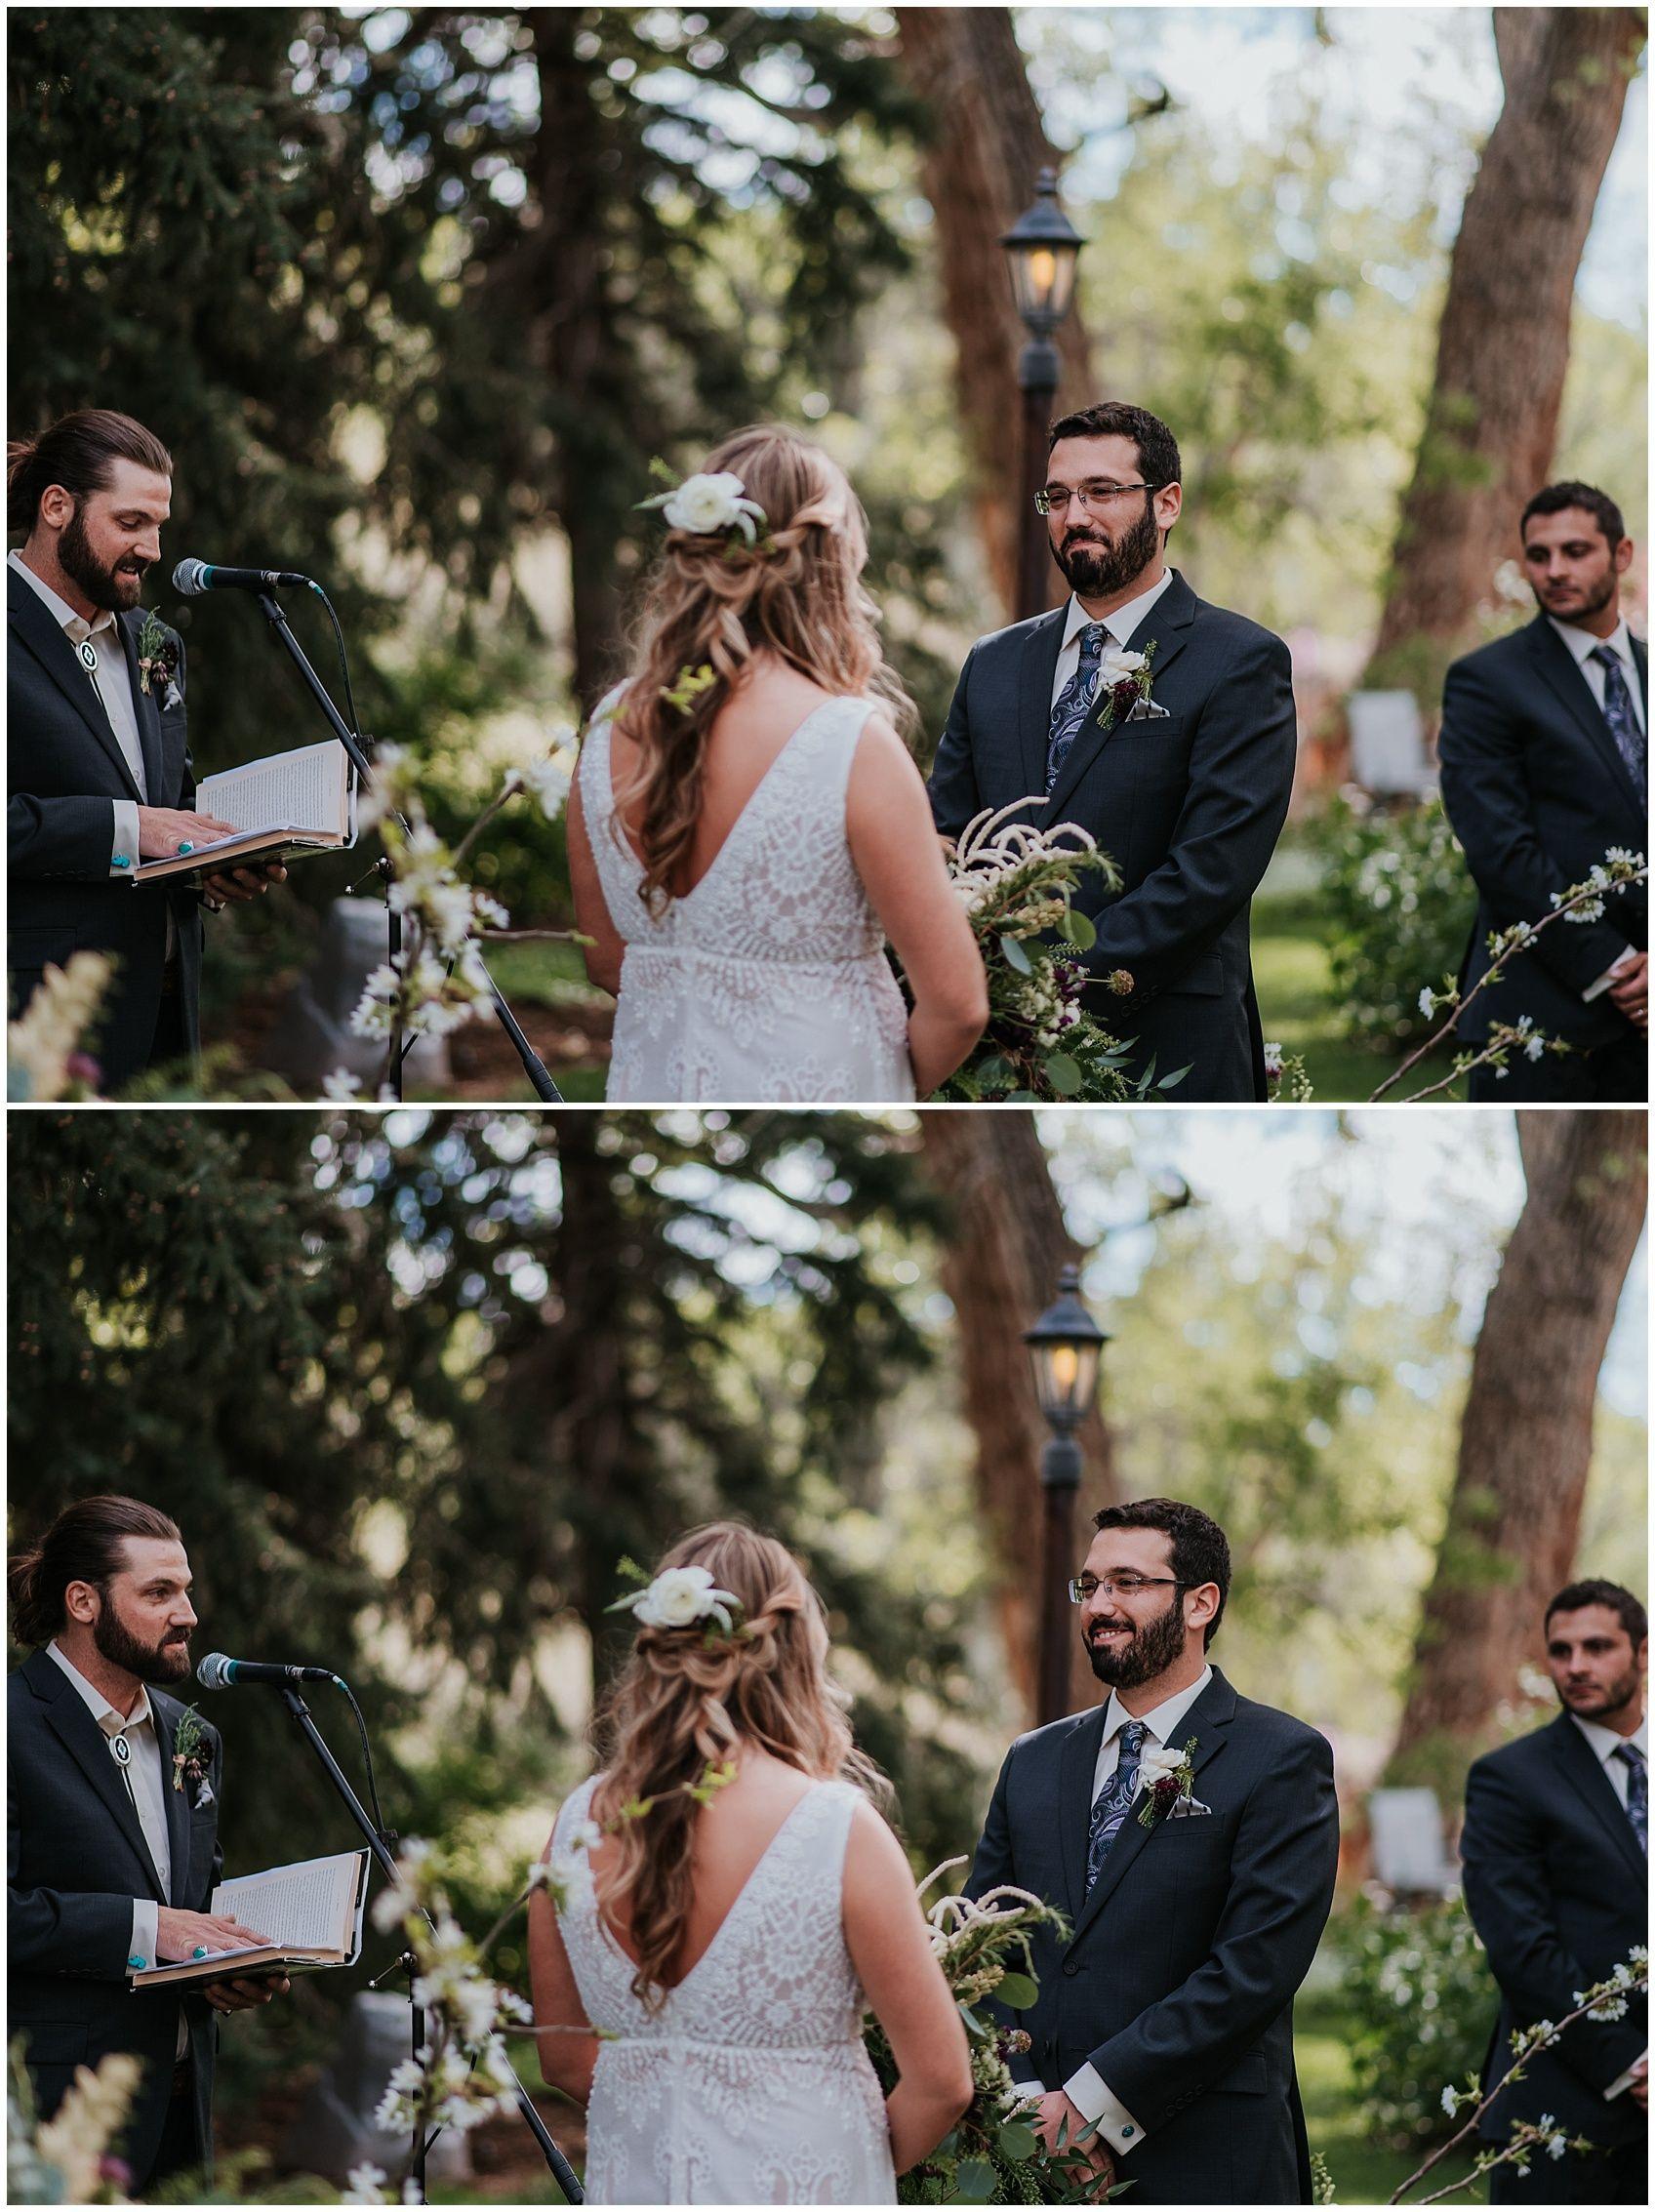 Molly Margaret Photography Lindsay Ben Haystack Hearth Wedding Denver Wedding Photographer Denver Wedding Colorado Wedding Photographer Bride Groom Poses